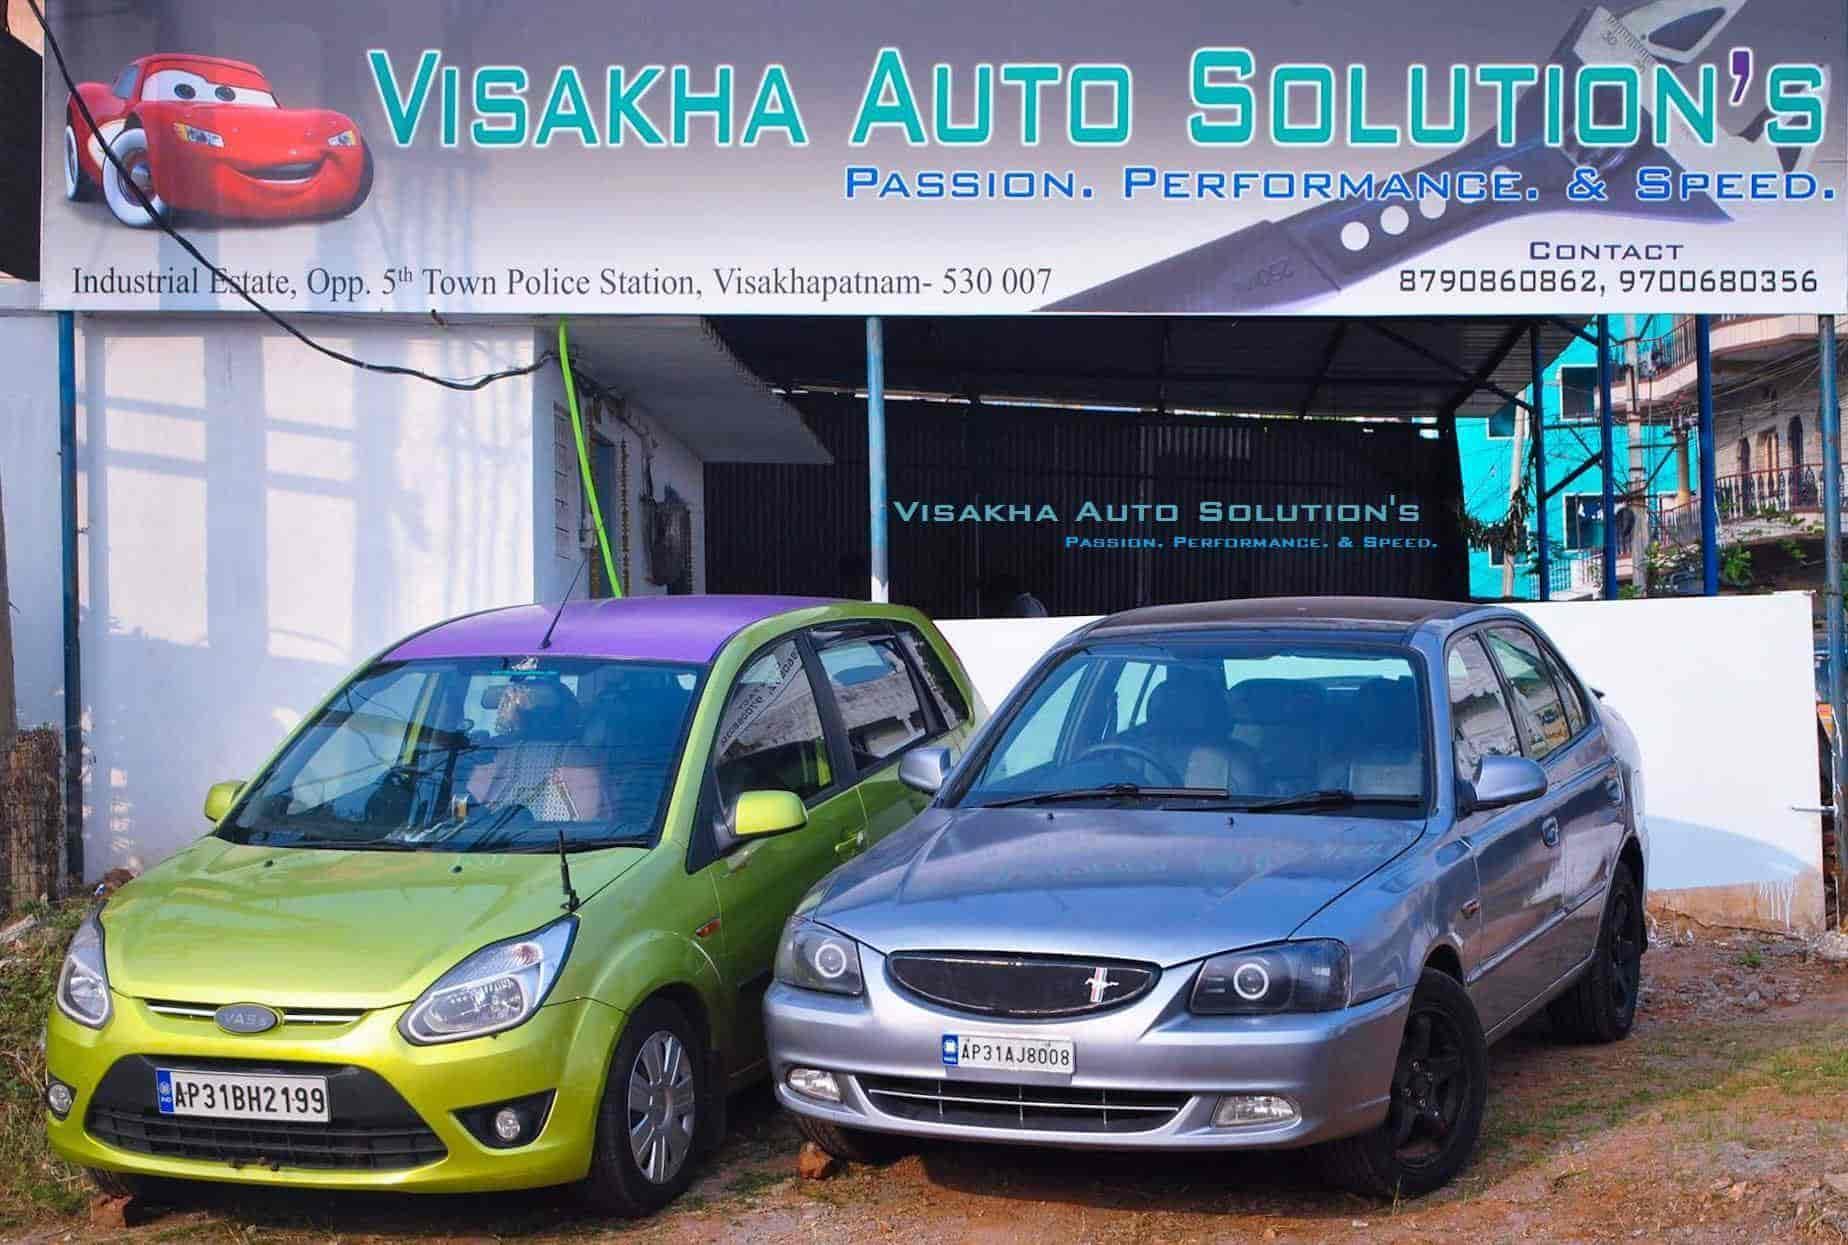 Visakha Auto Solutions Industrial Estate Car Repair & Services in